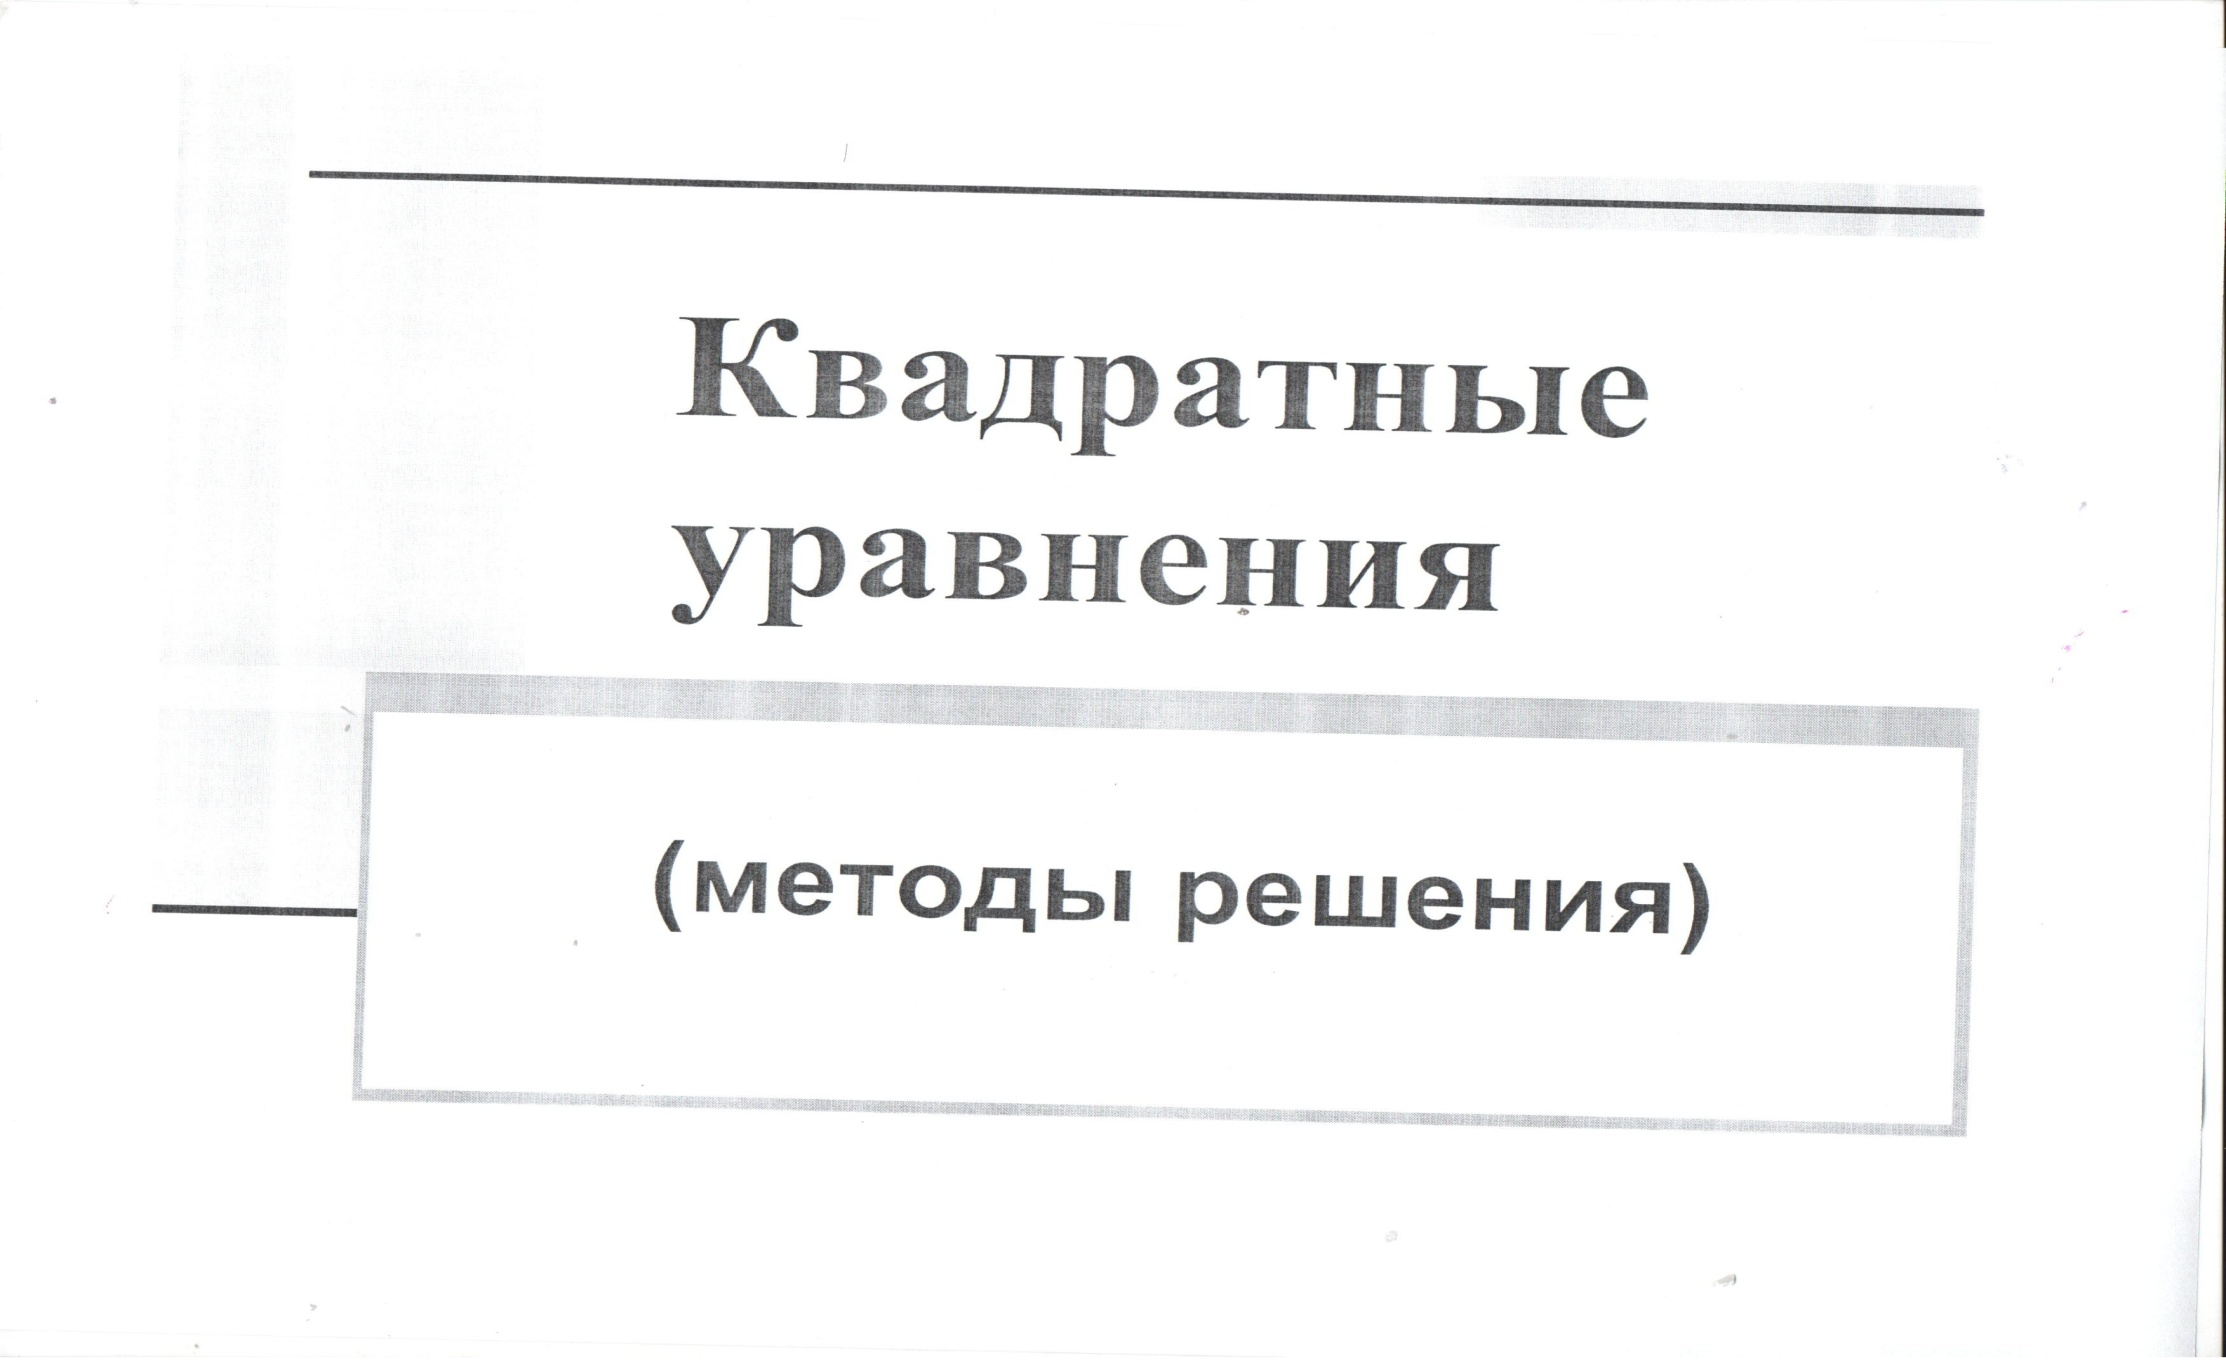 C:\Documents and Settings\Школа\Мои документы\Мои рисунки\Изображение\Изображение 020.jpg